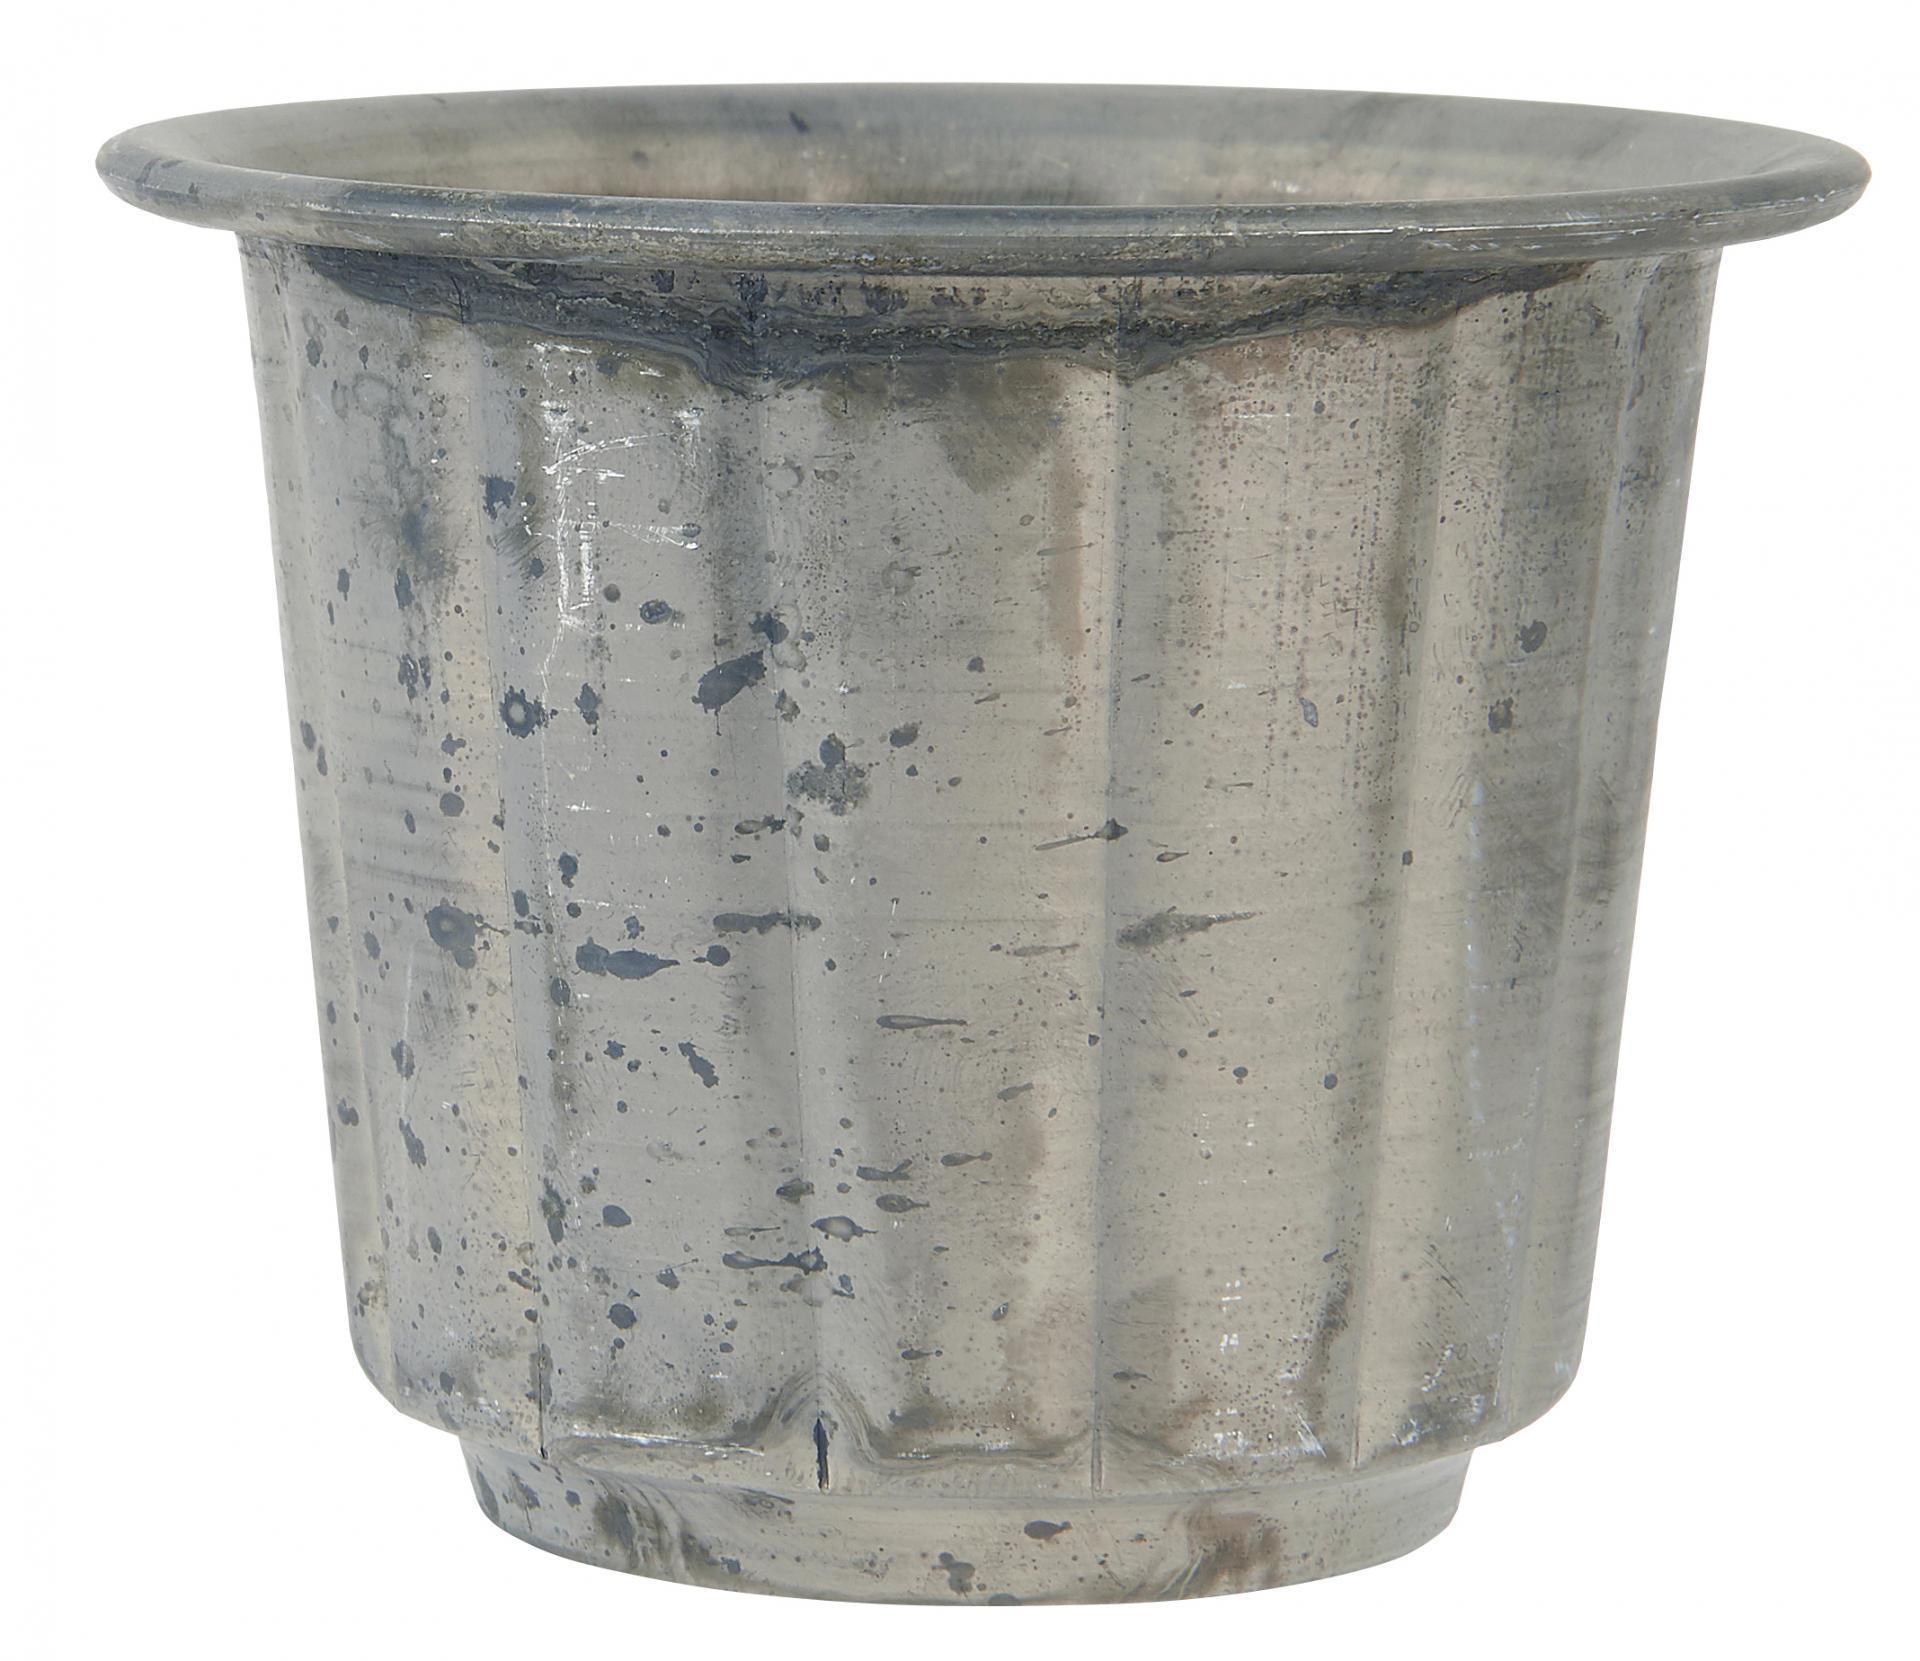 IB LAURSEN Kovový mini obal na květináč Mini Grooved, šedá barva, kov